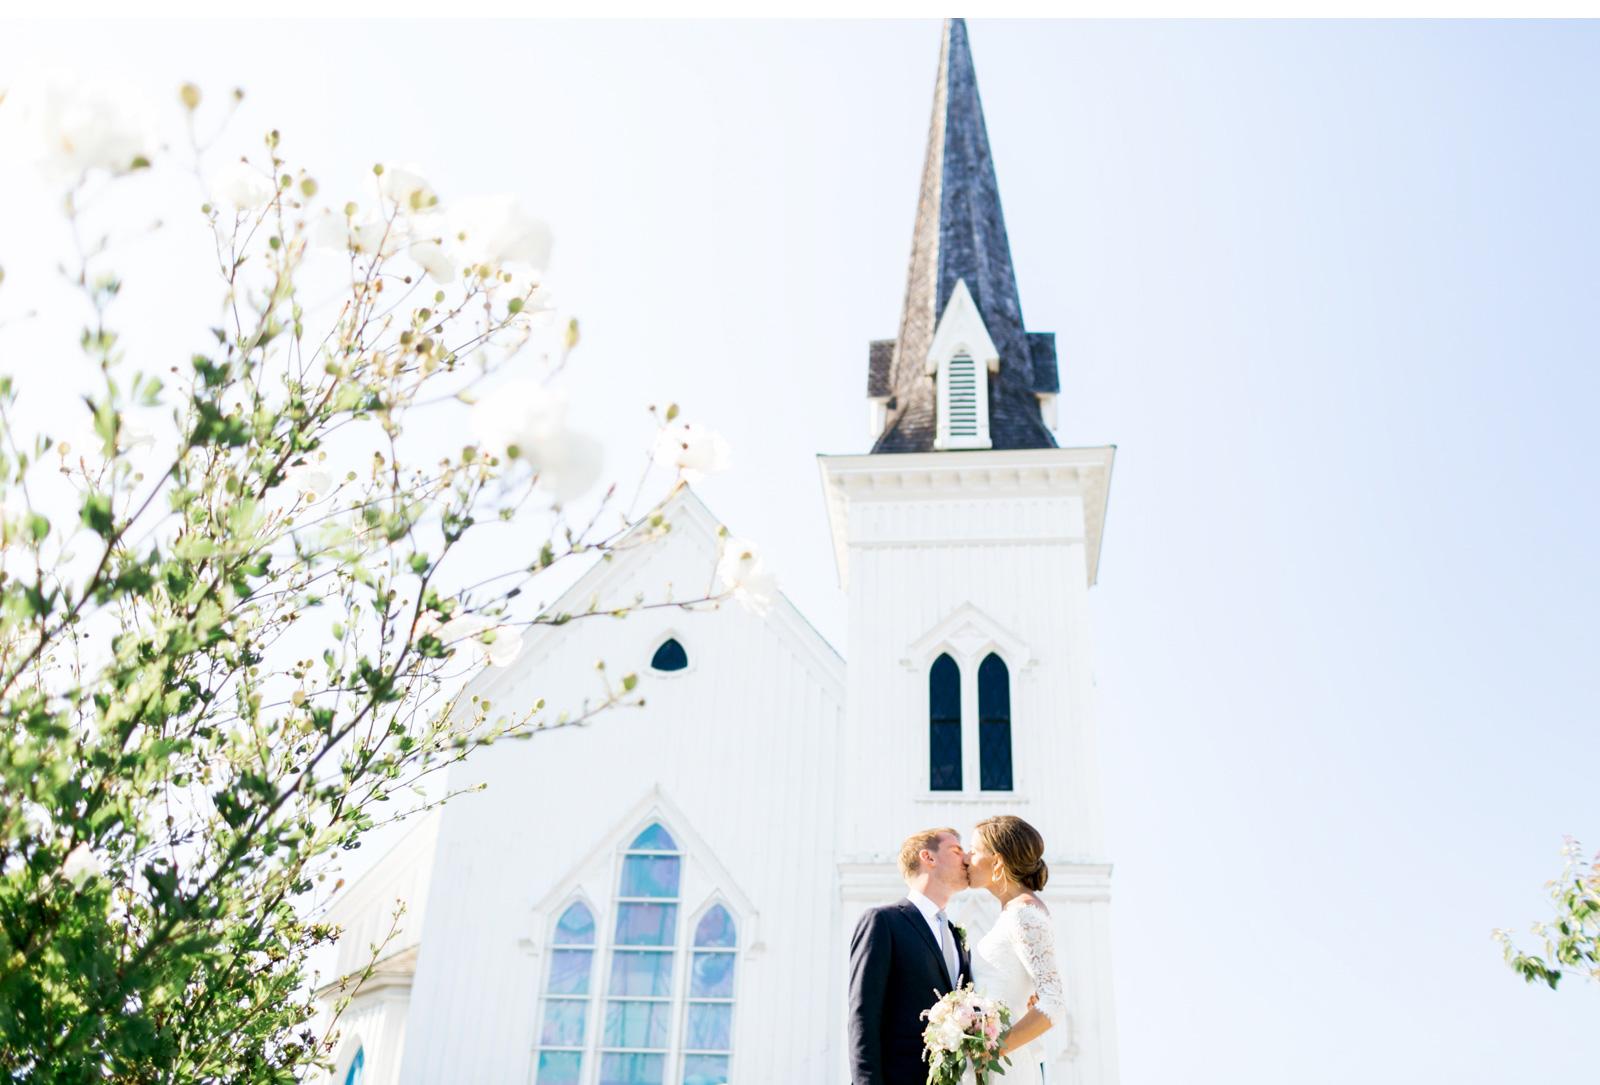 Style-Me-Pretty-Mendocino-Wedding-Natalie-Schutt-Photography_09.jpg